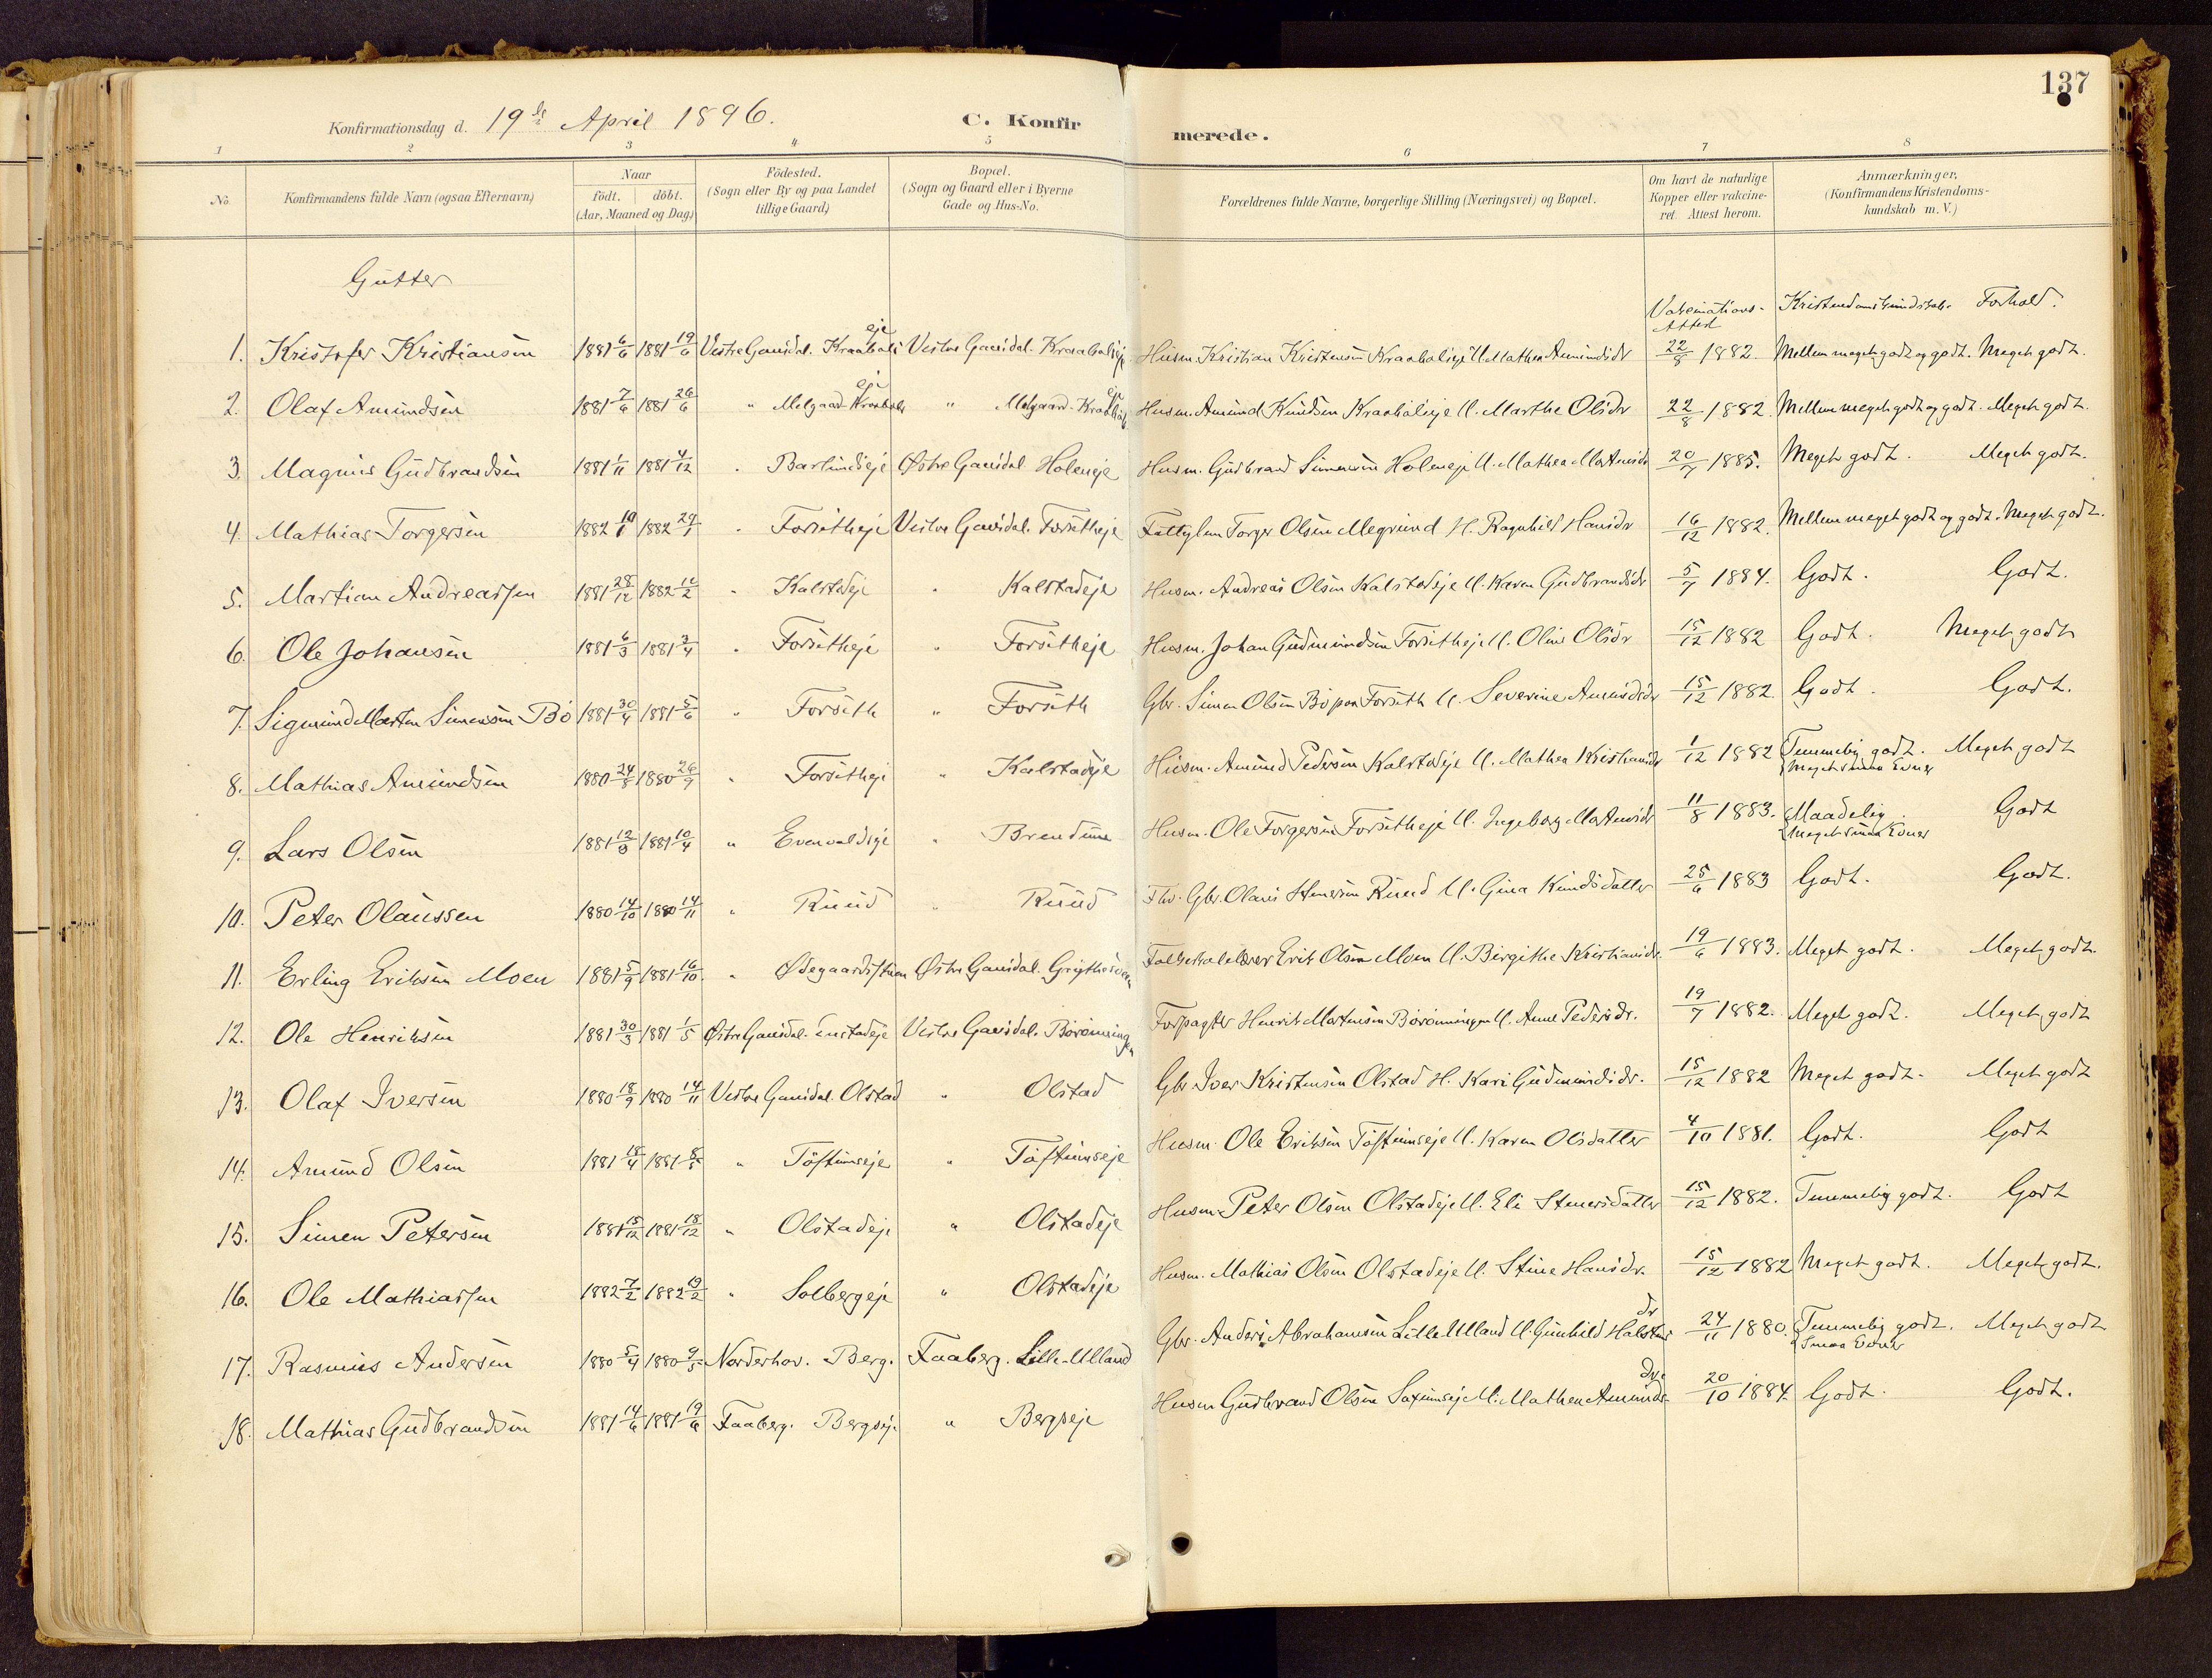 SAH, Vestre Gausdal prestekontor, Ministerialbok nr. 1, 1887-1914, s. 137